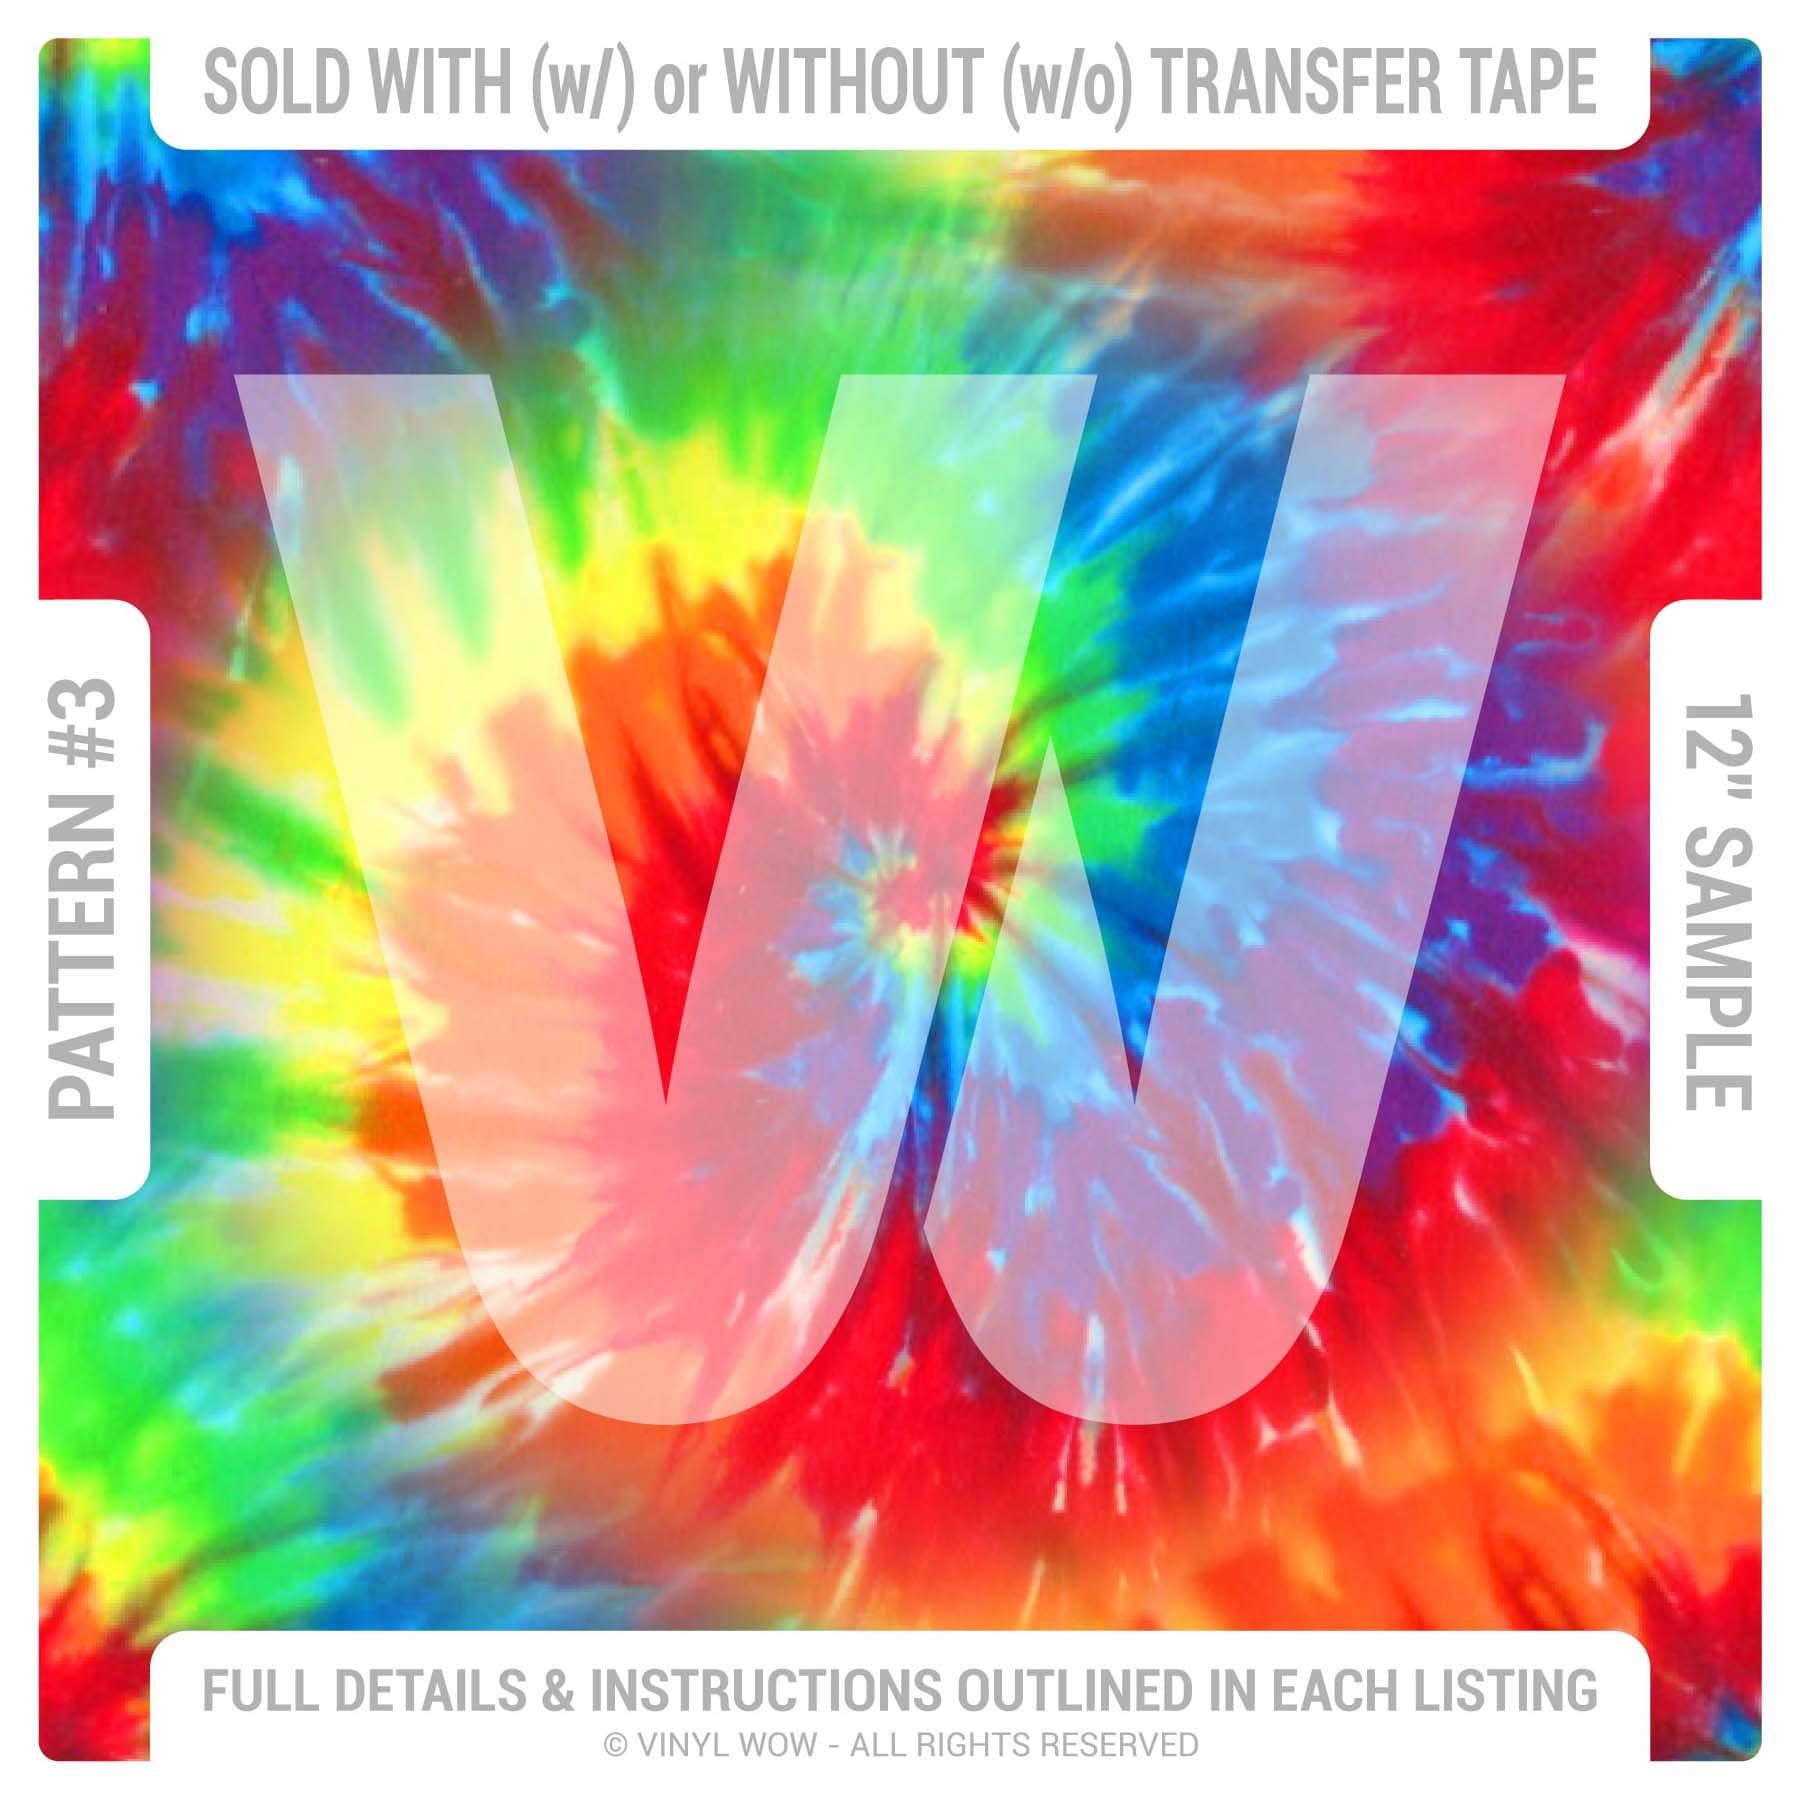 siser heat transfer vinyl instructions